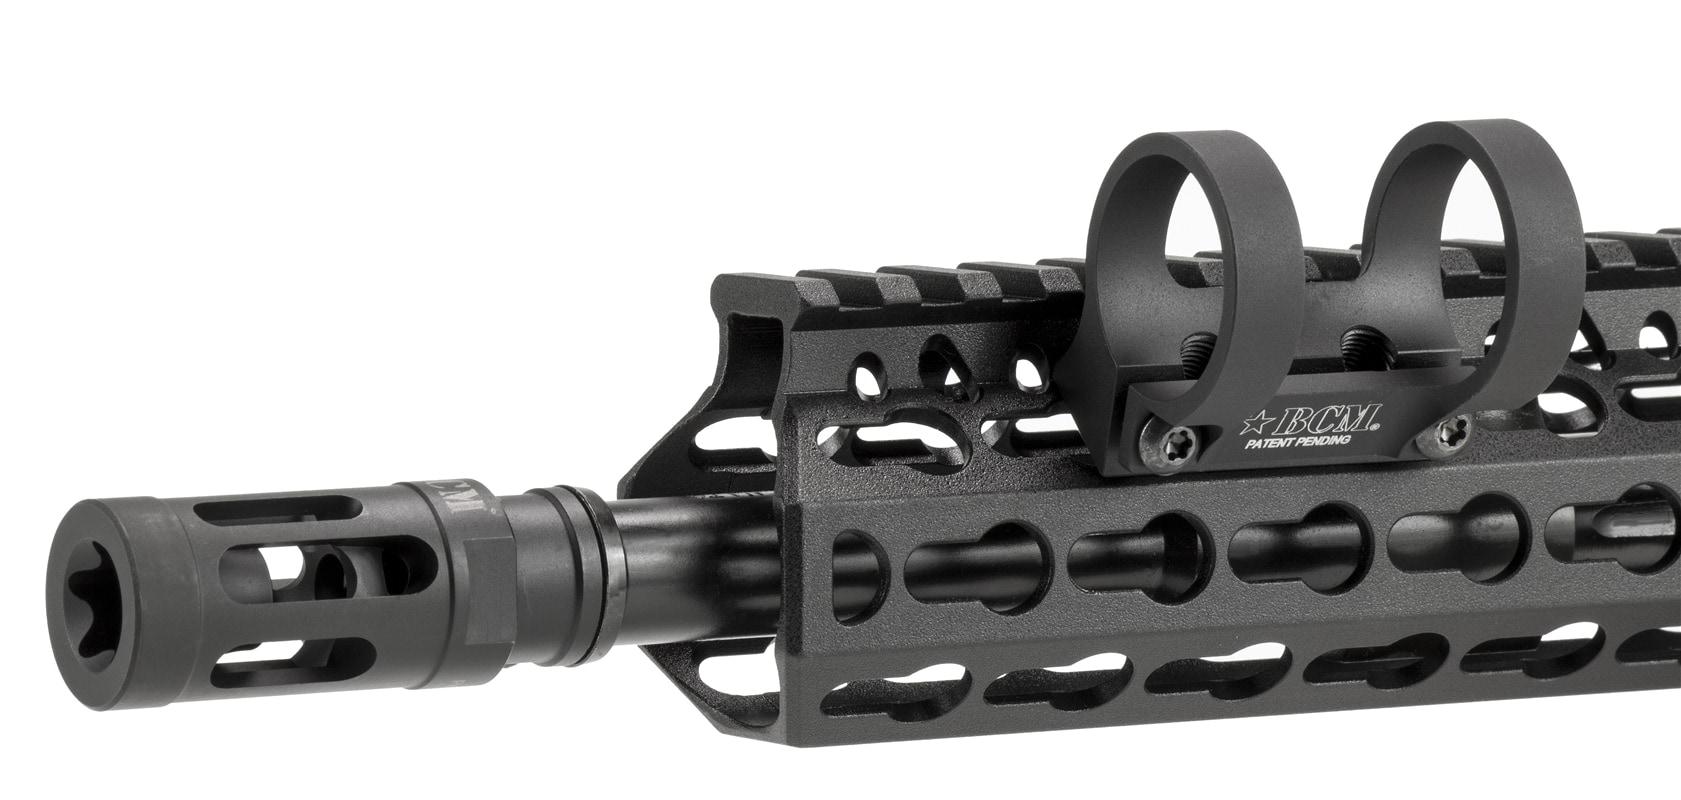 KeyMod utilizes keyhole shapes to mount rifle accessories to the handguard. (Photo: Bravo Company)